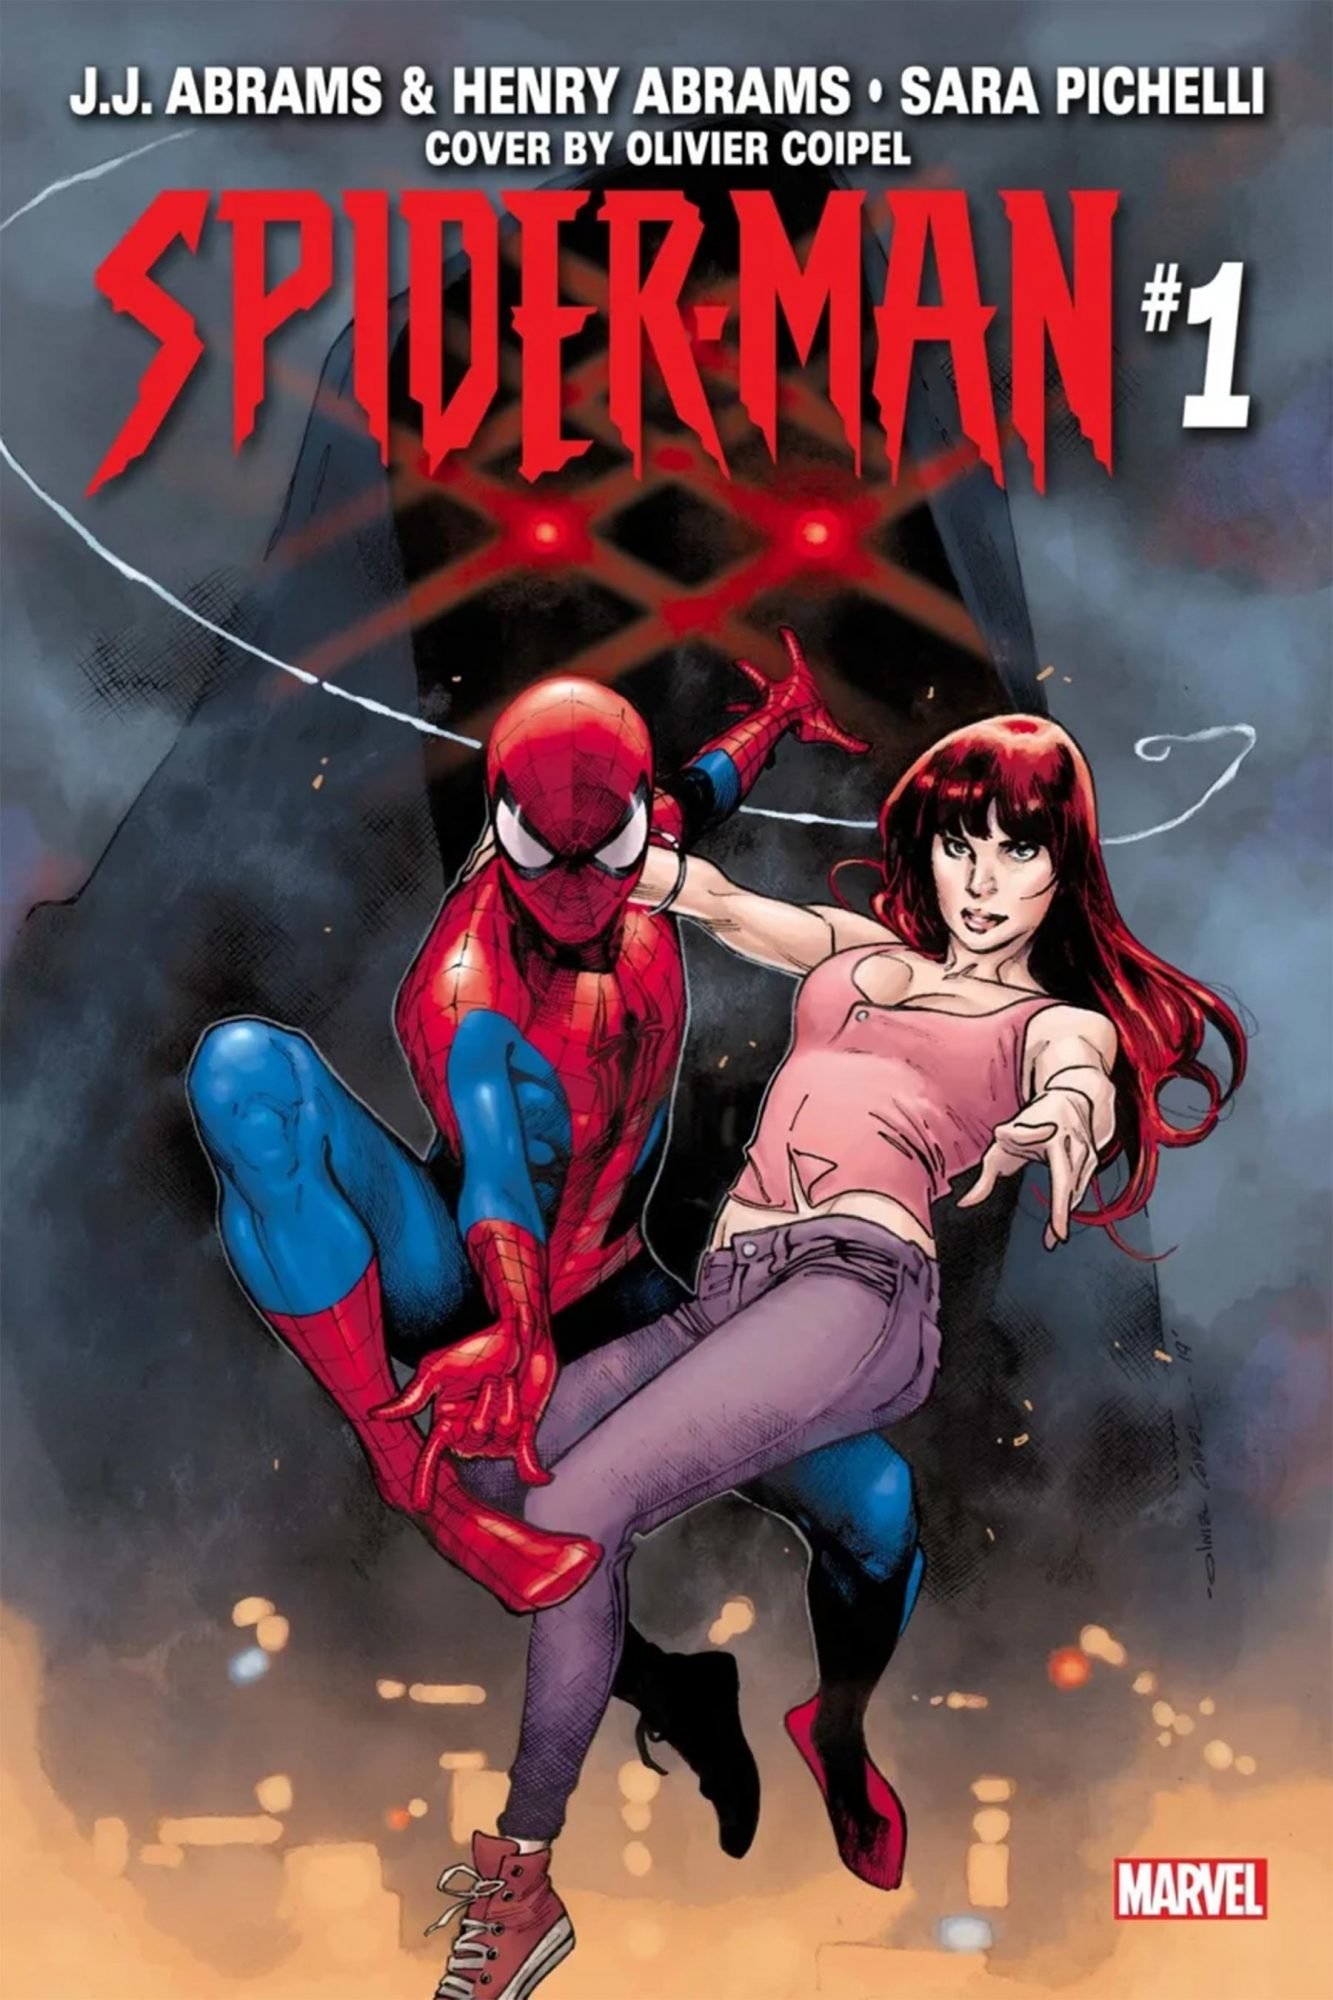 Spider-Man #1 by J.J. Abrams